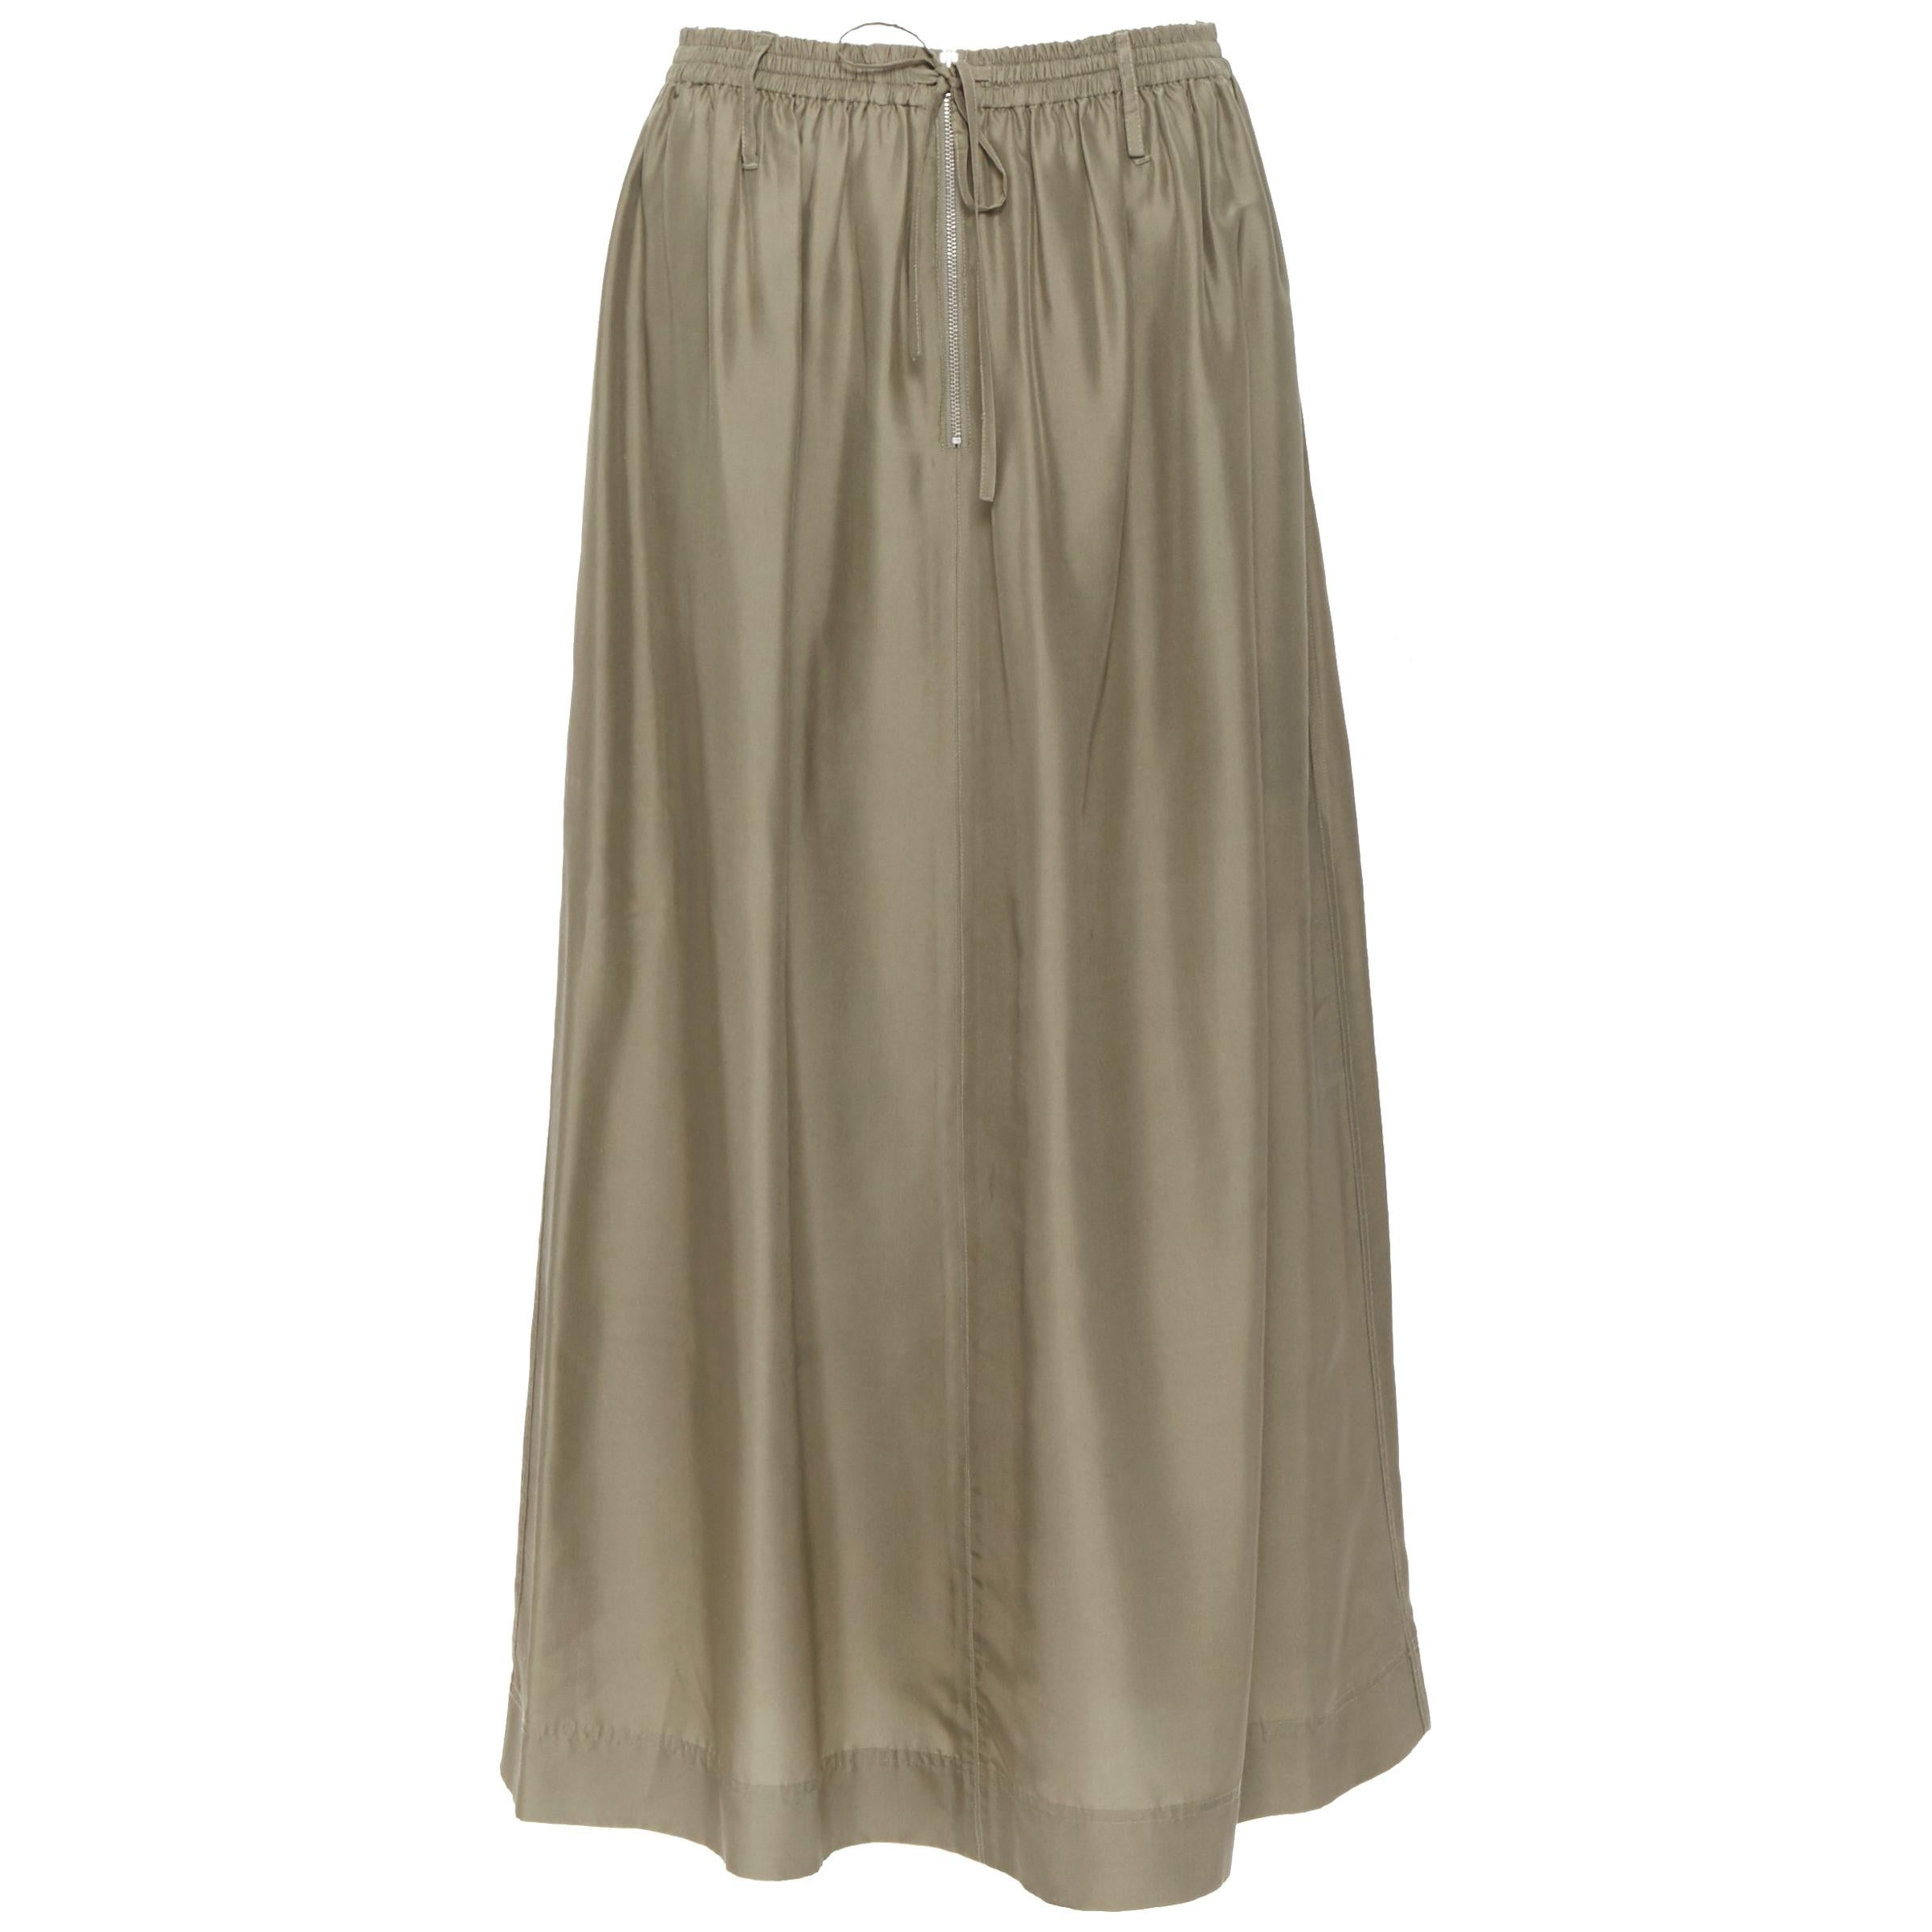 JOSEPH 100% silk muted grey elasticated drawstring zip detail midi skirt FR34 XS